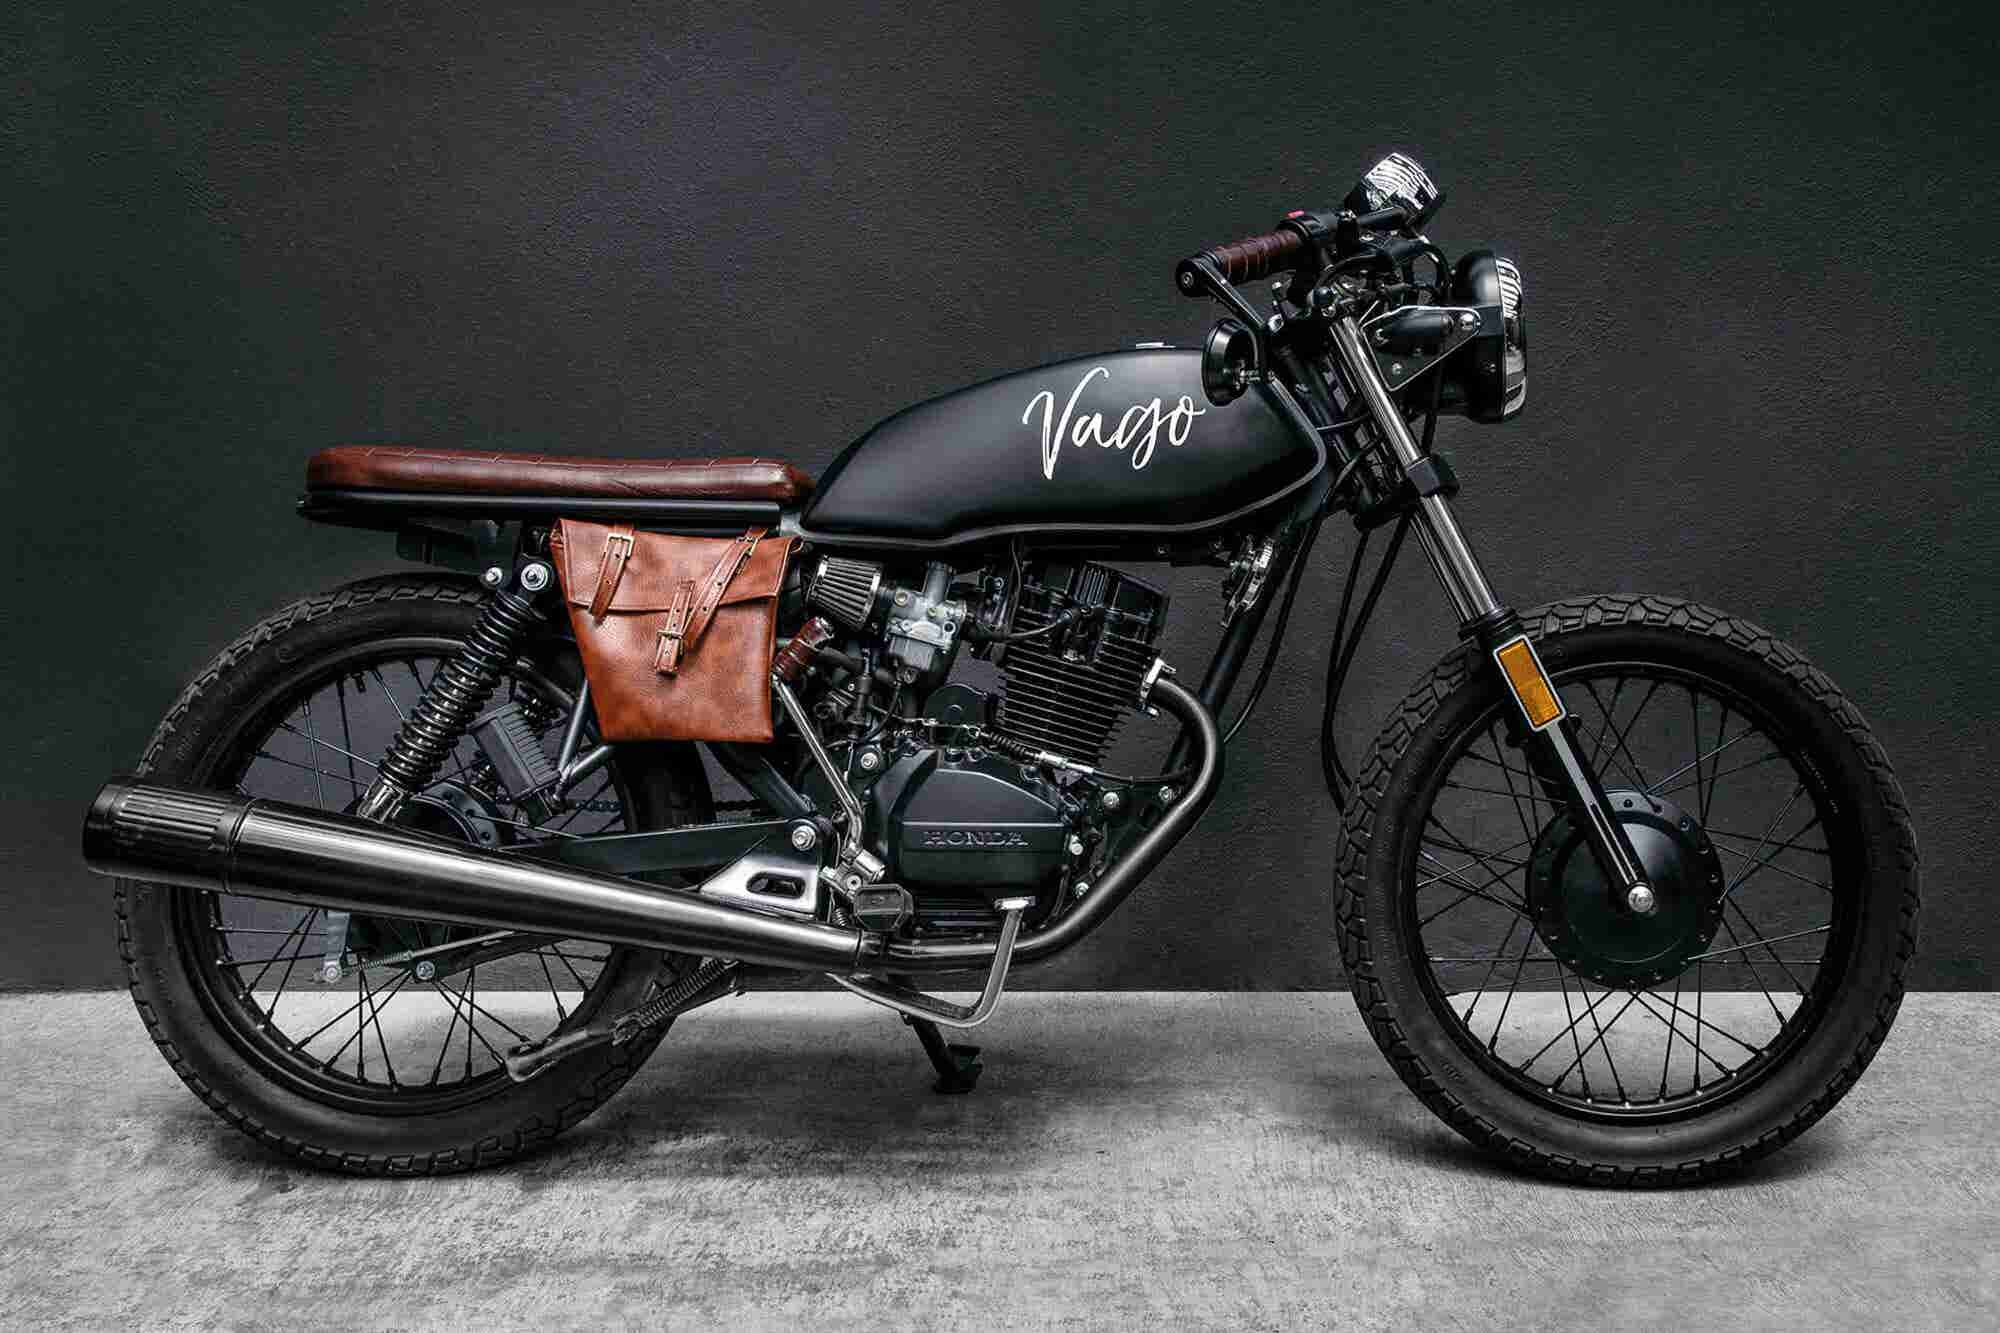 ¡Atrévete a diseñar una motocicleta clásica!